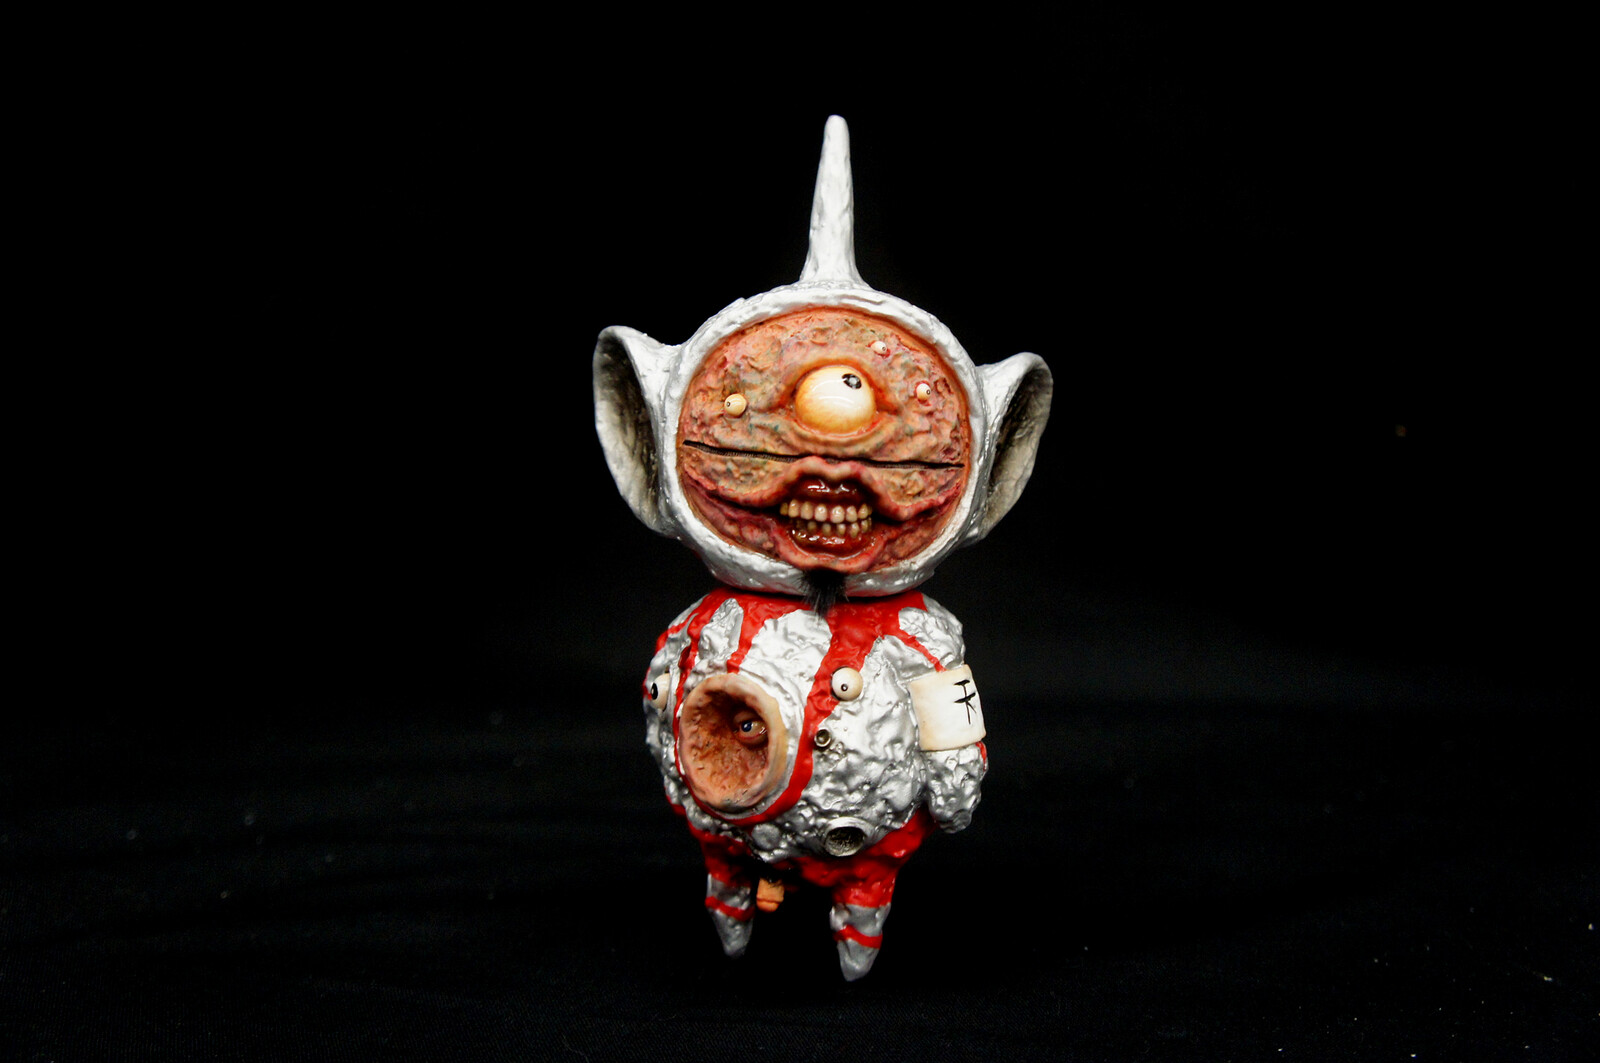 Telemimi in Ultraman Suit Art Statue  https://www.solidart.club/